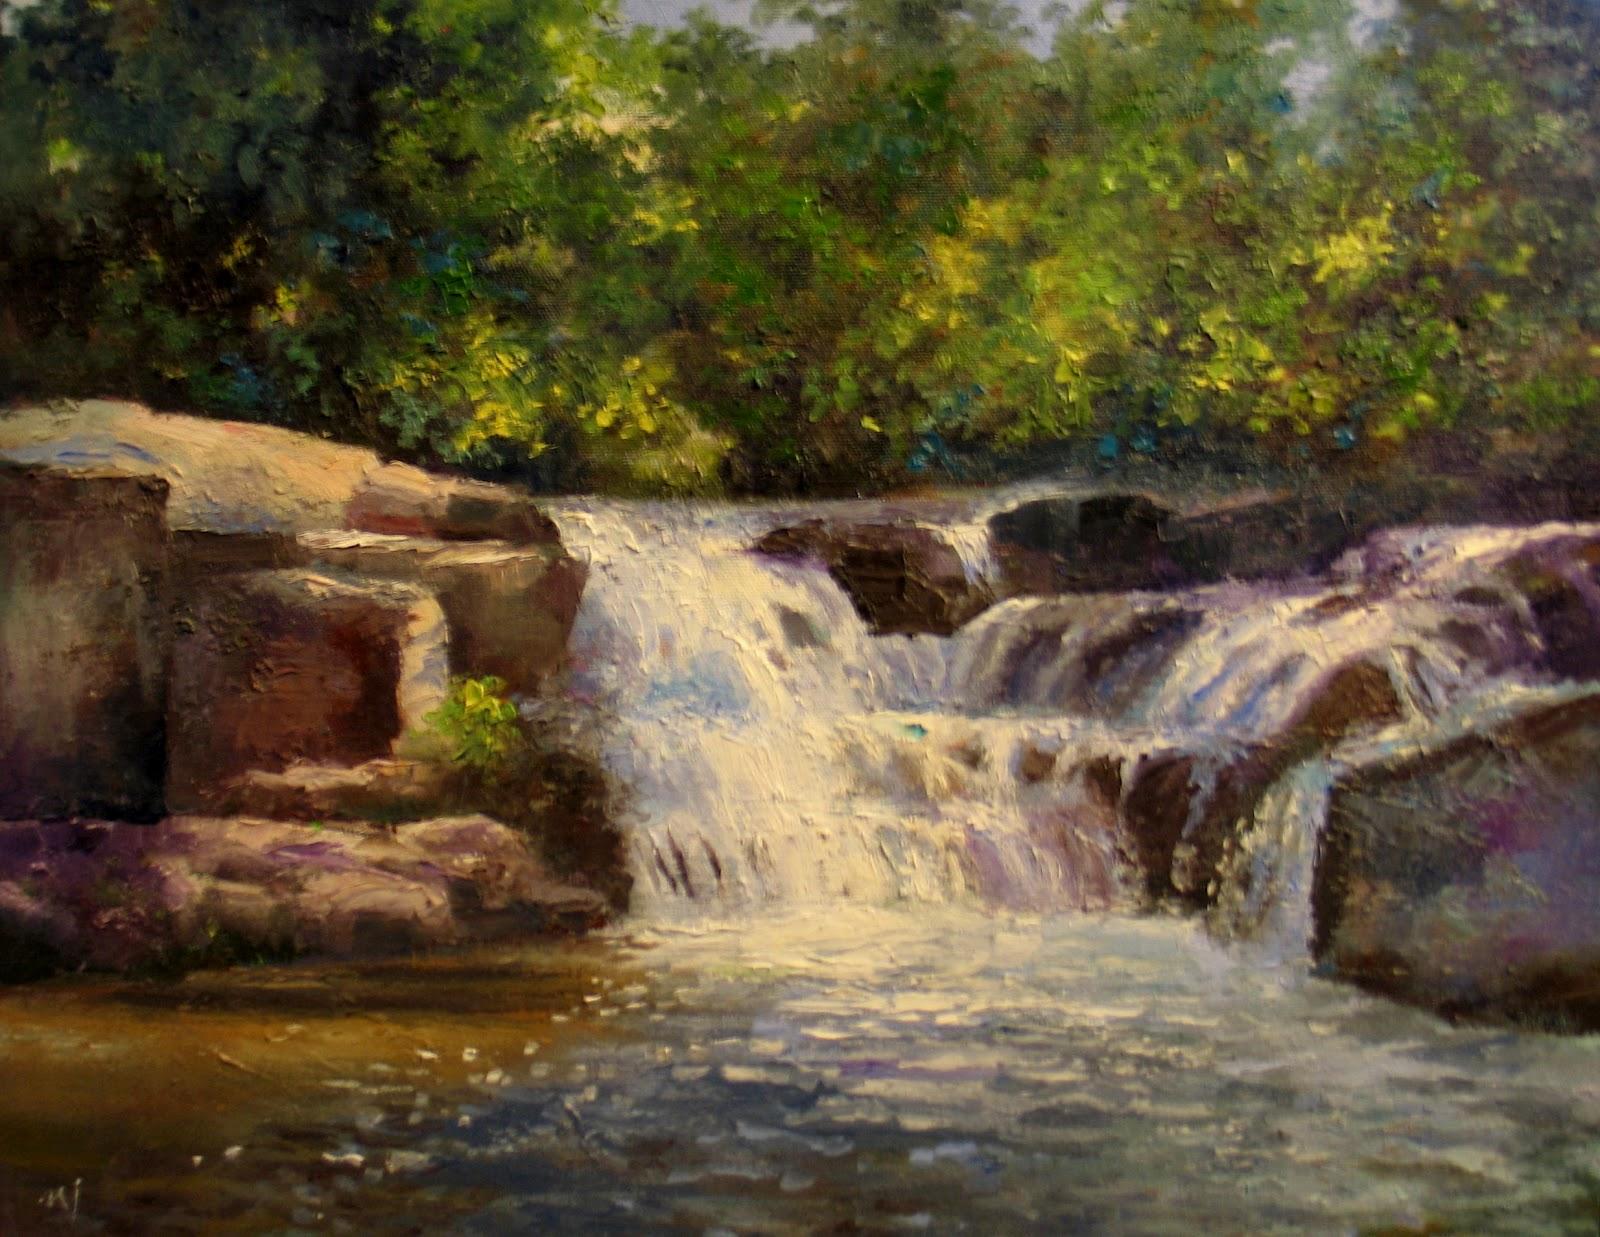 Painting Waterfalls In Oils